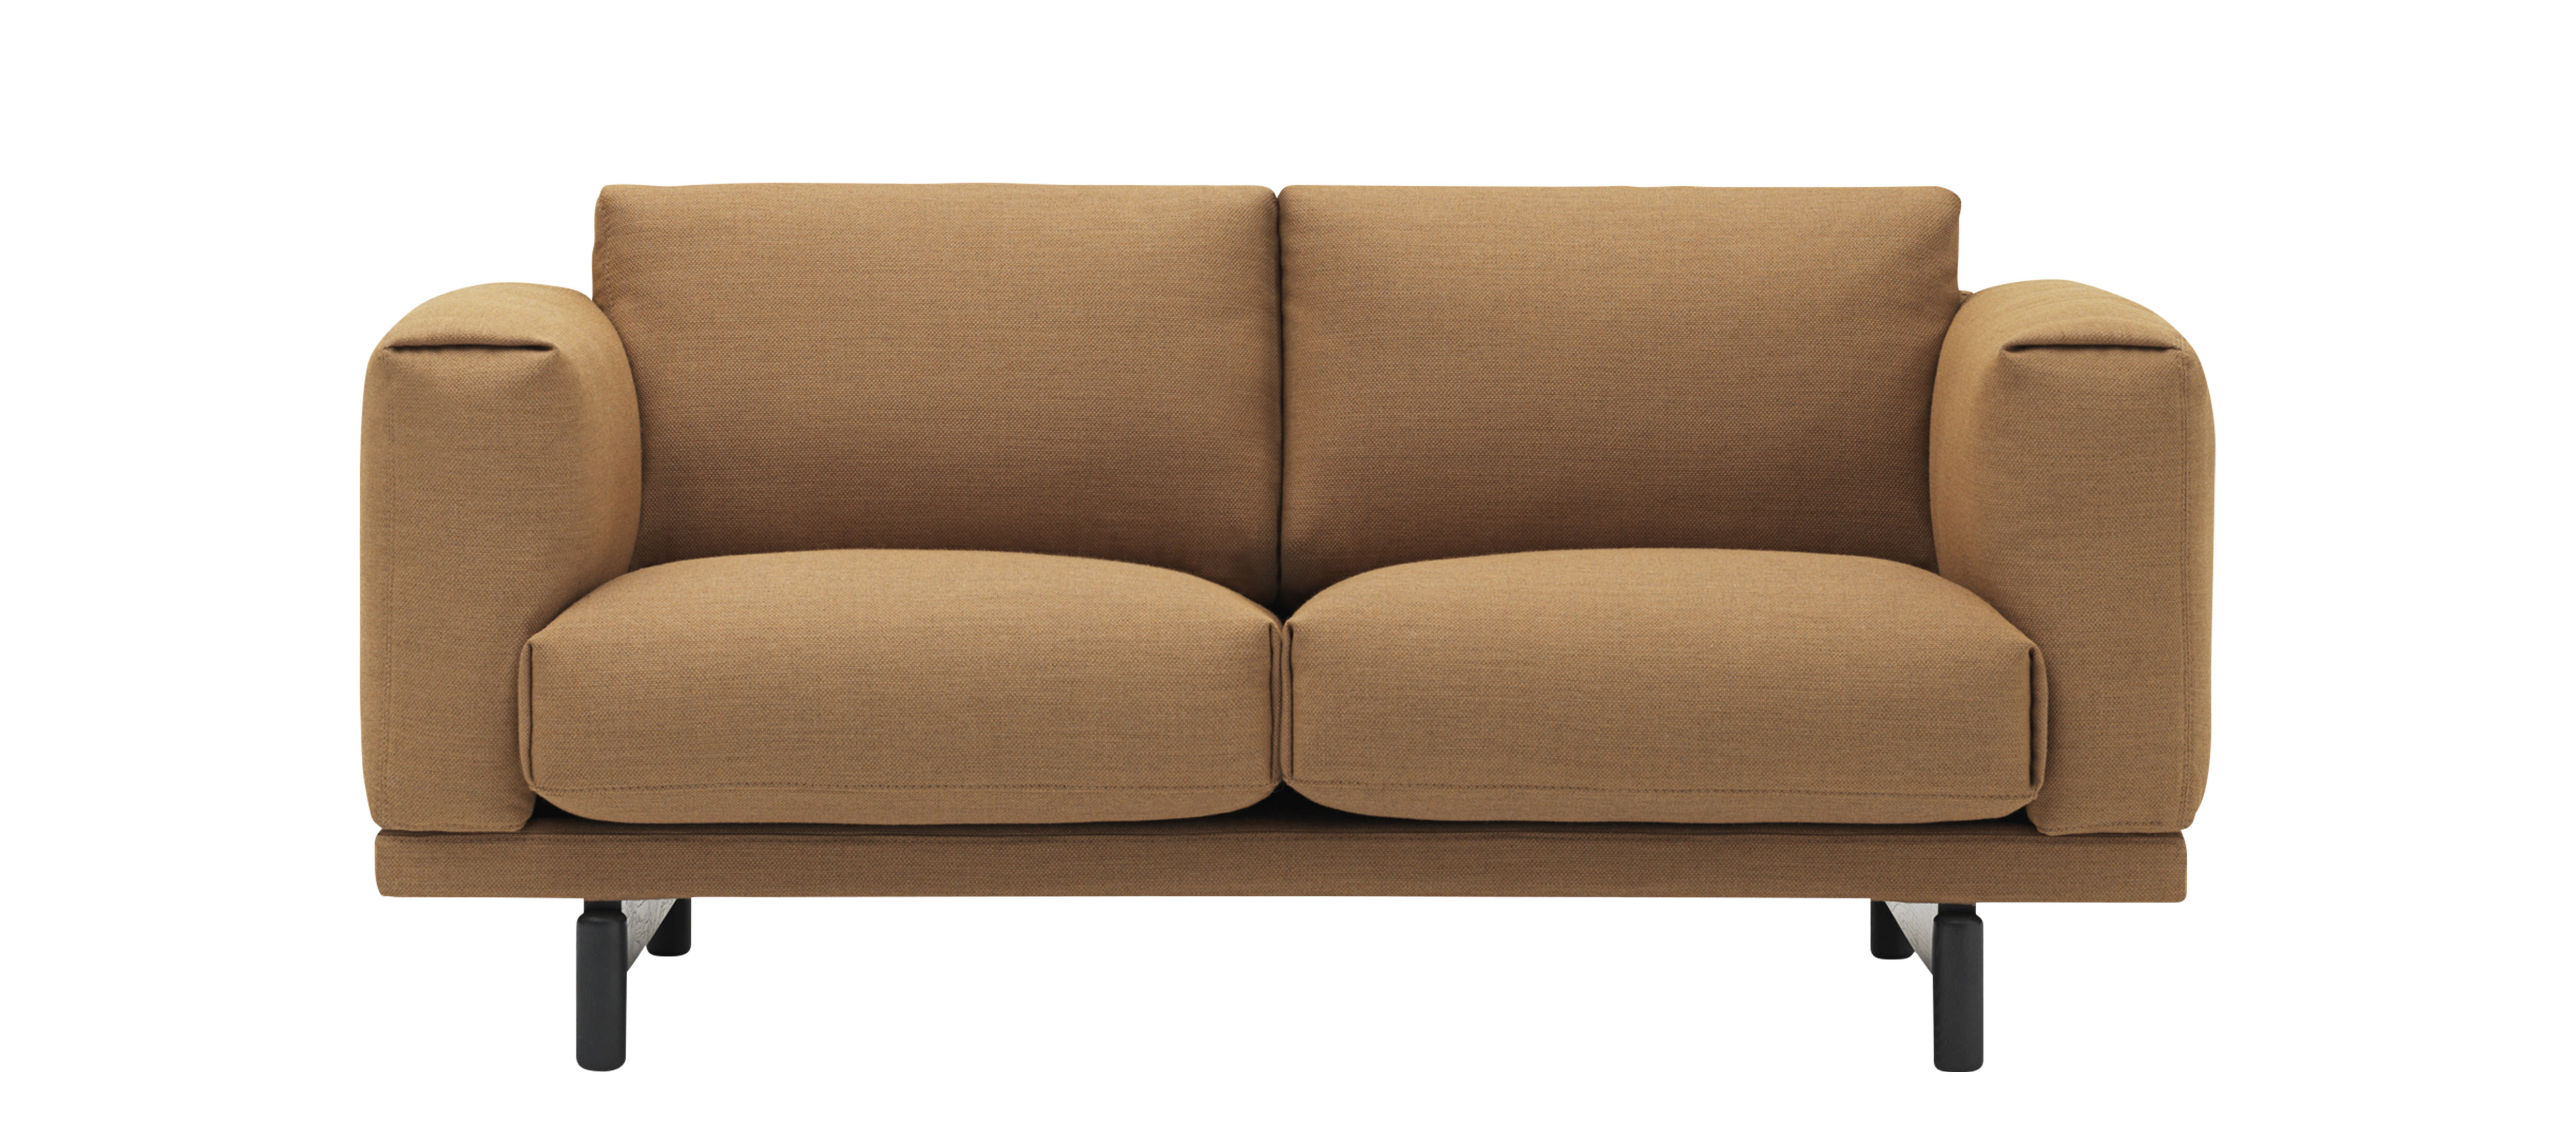 Furniture - Sofas - Rest Studio 2 seater sofa - / L 165 cm by Muuto - Camel / Black legs -  Plumes, Foam, Kvadrat fabric, Tinted oak